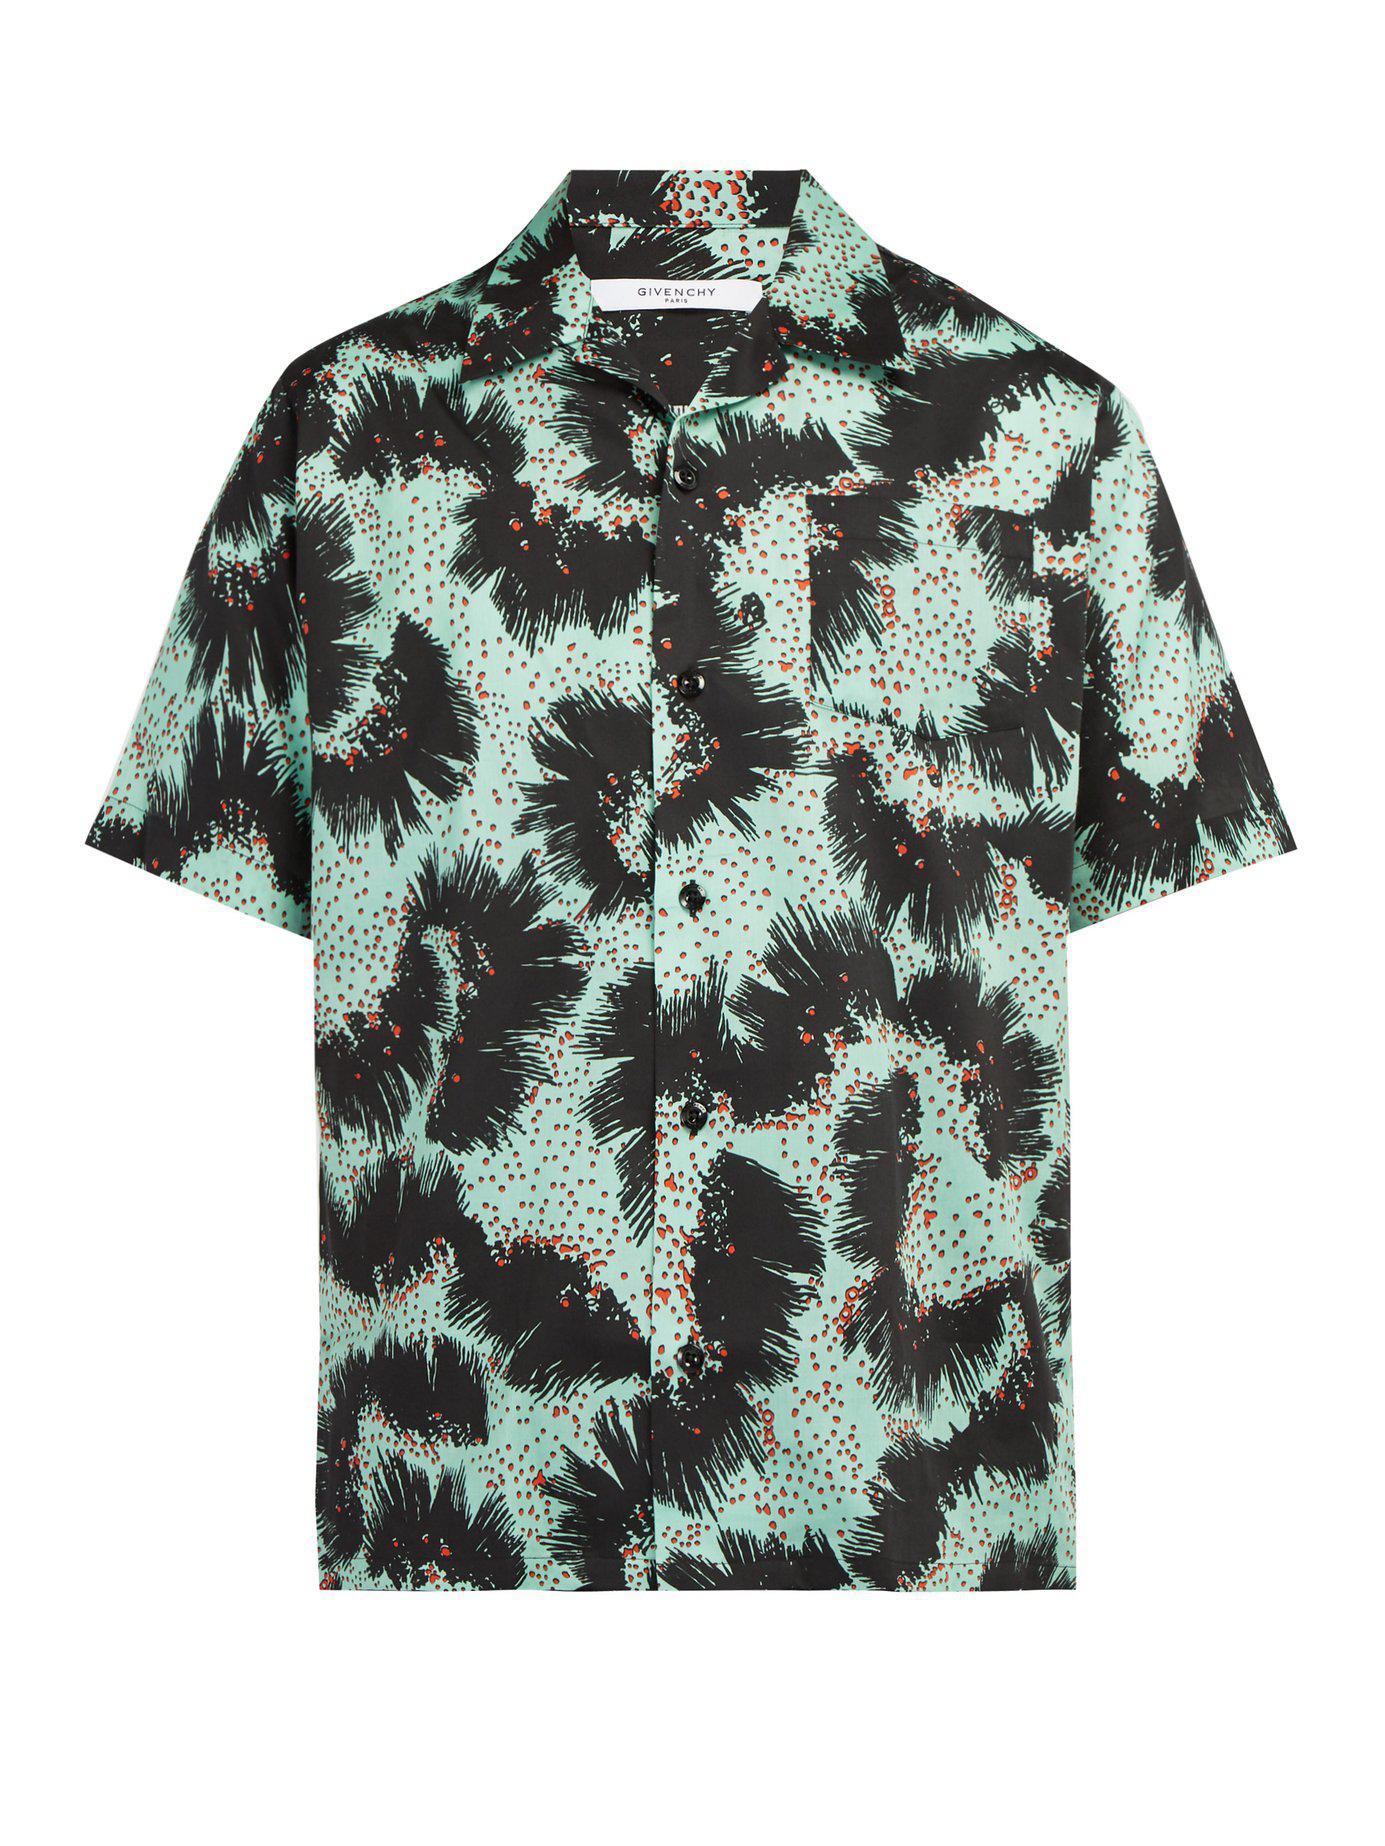 cf995e89b654 Givenchy - Green Short Sleeve Shirt for Men - Lyst. View fullscreen